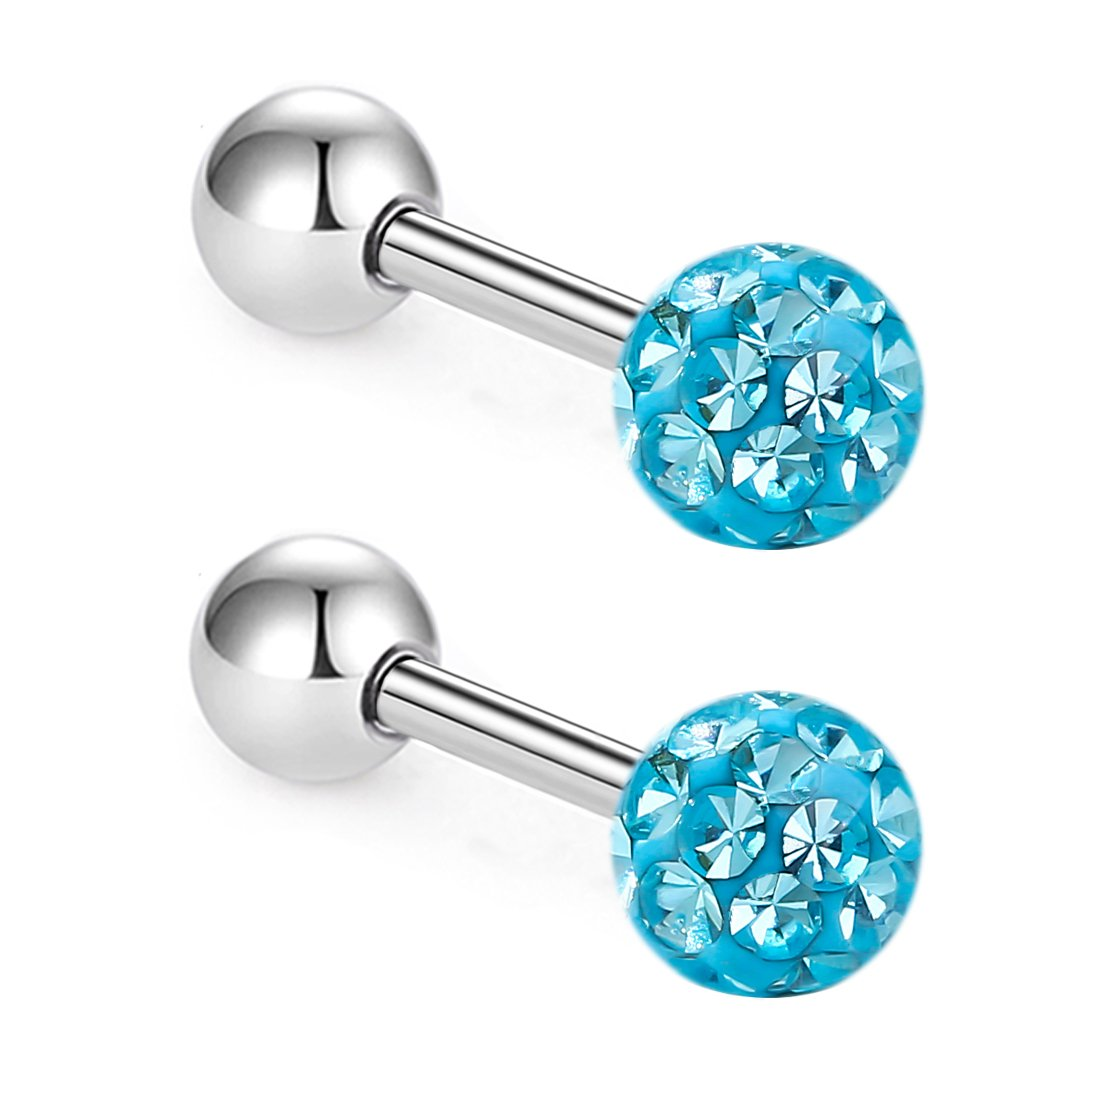 ZHIYAOR 16G Hypoallergenic Tragus Cartilage Earrings Women Surgical Steel Stud Earring for Sensitive Ear Generic BYED001